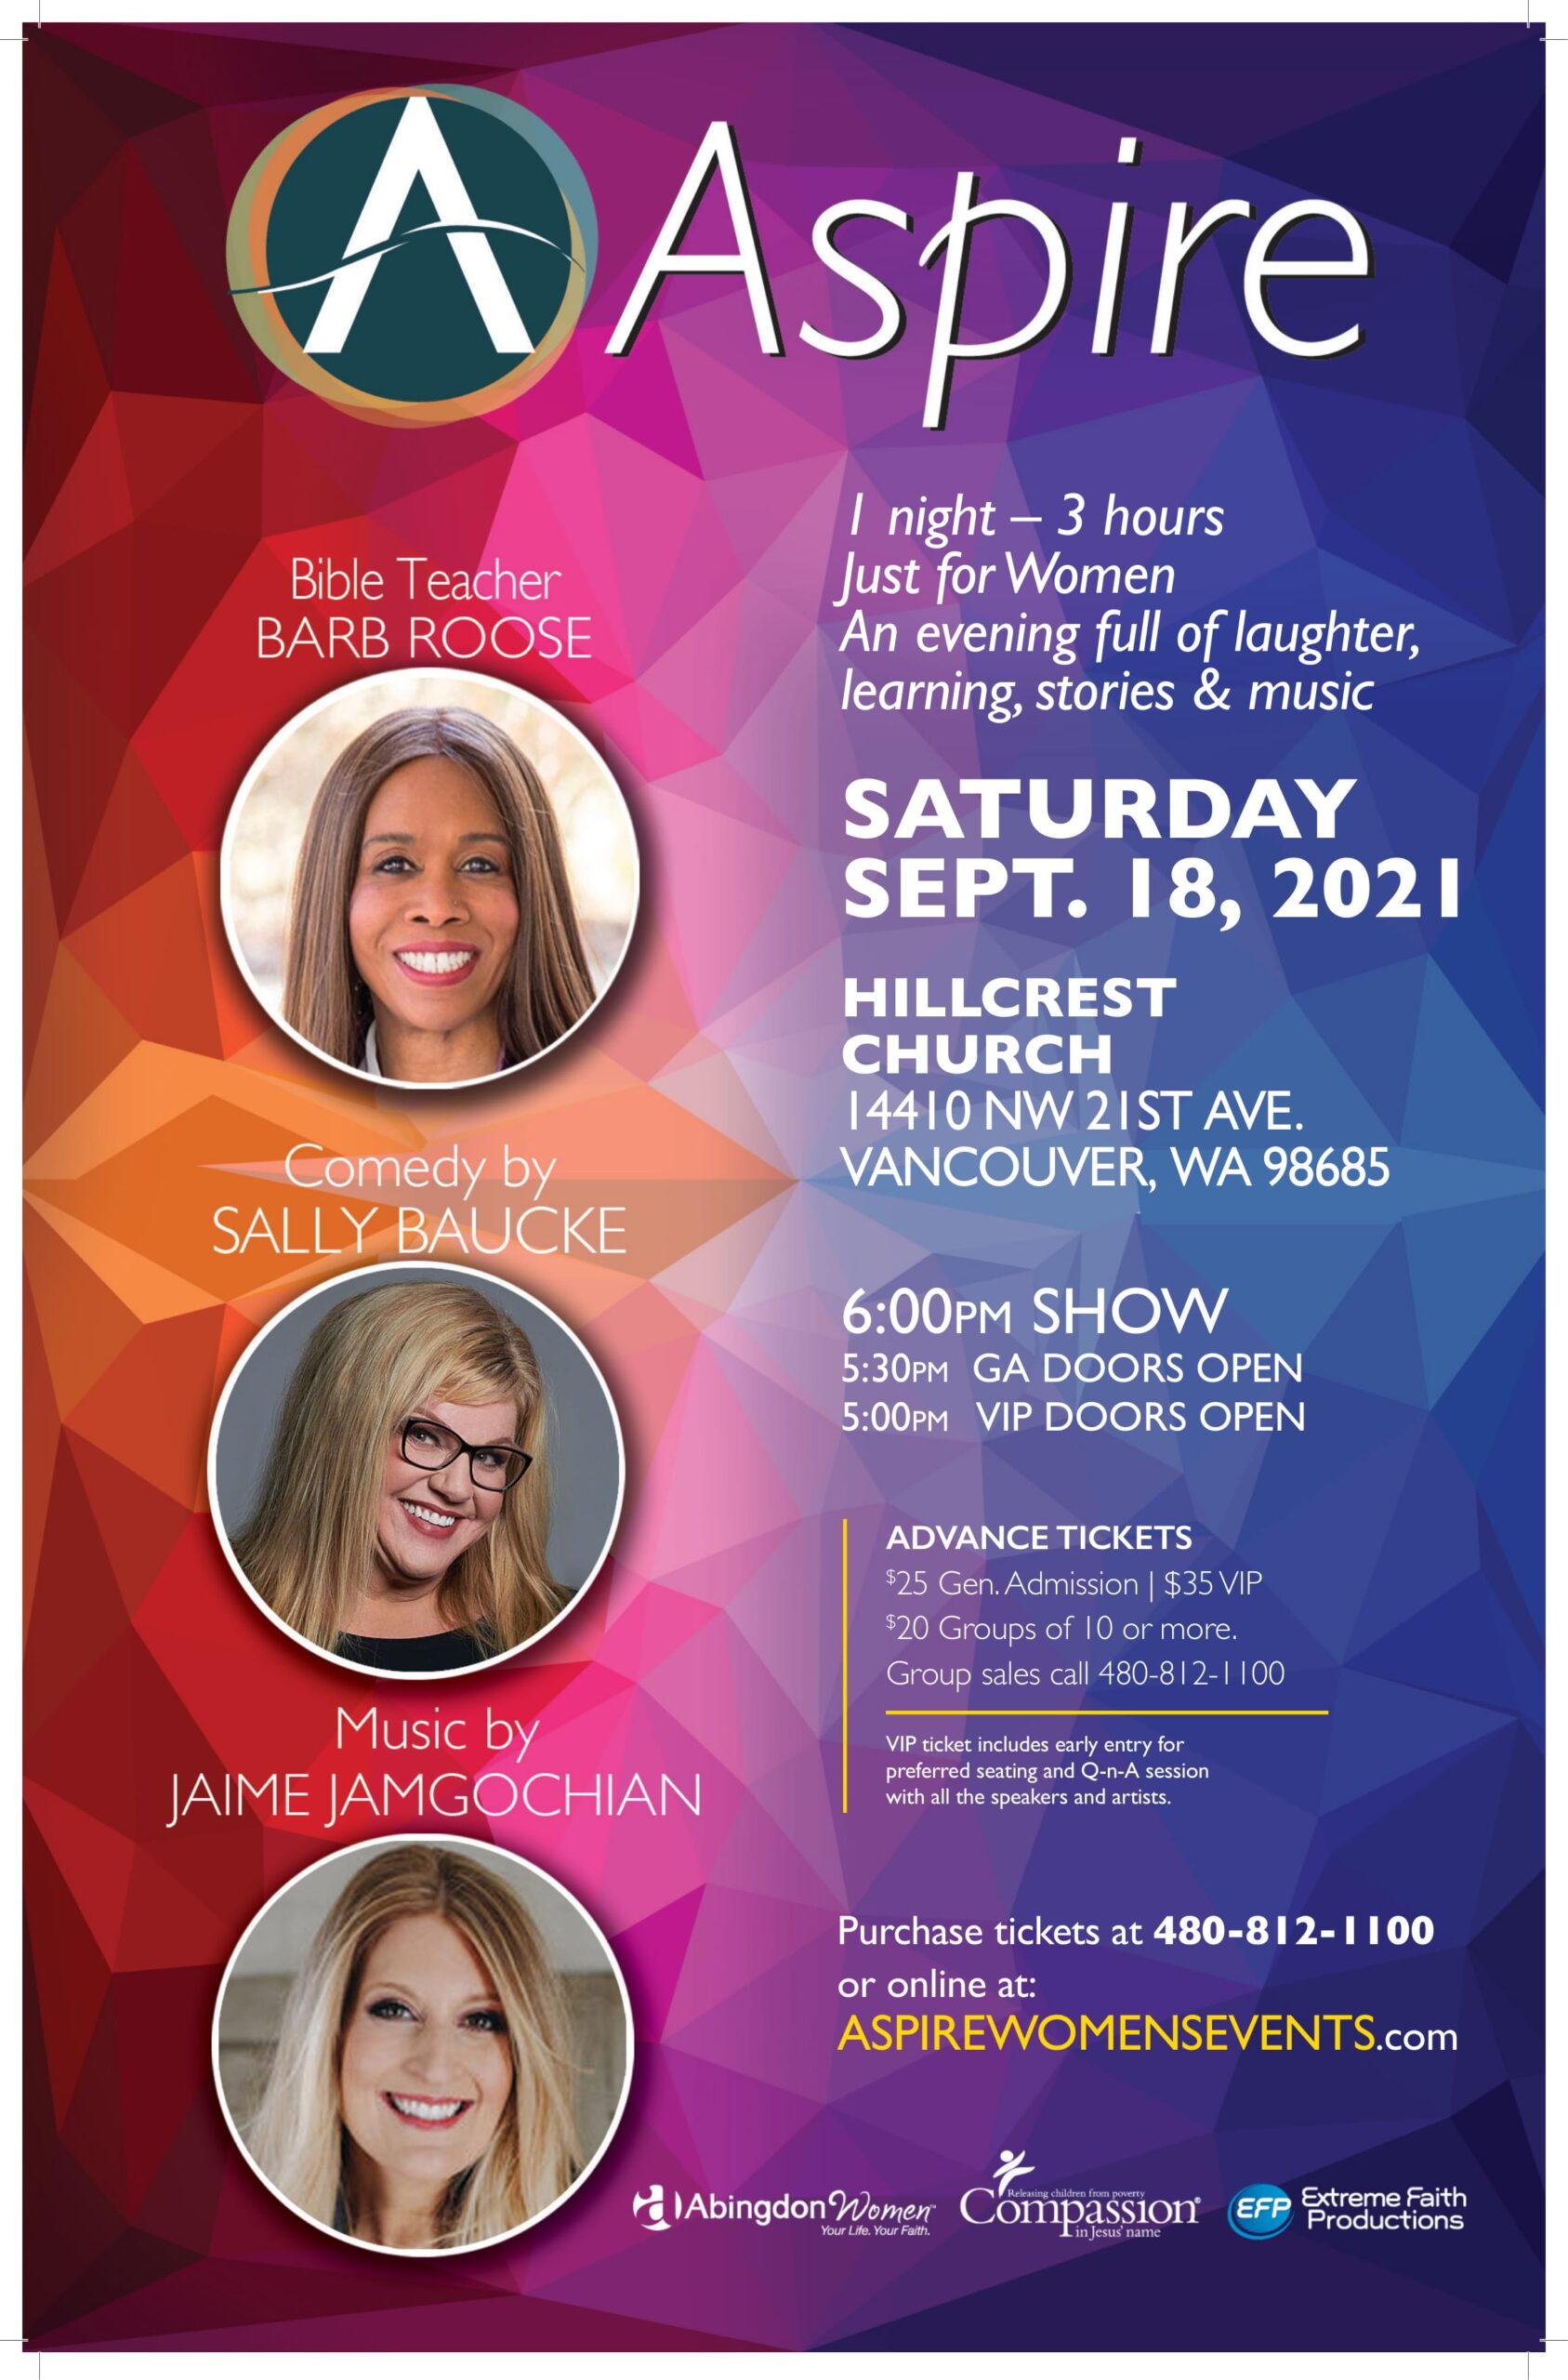 ASPIRE SAT Sept 18 Vancouver Poster